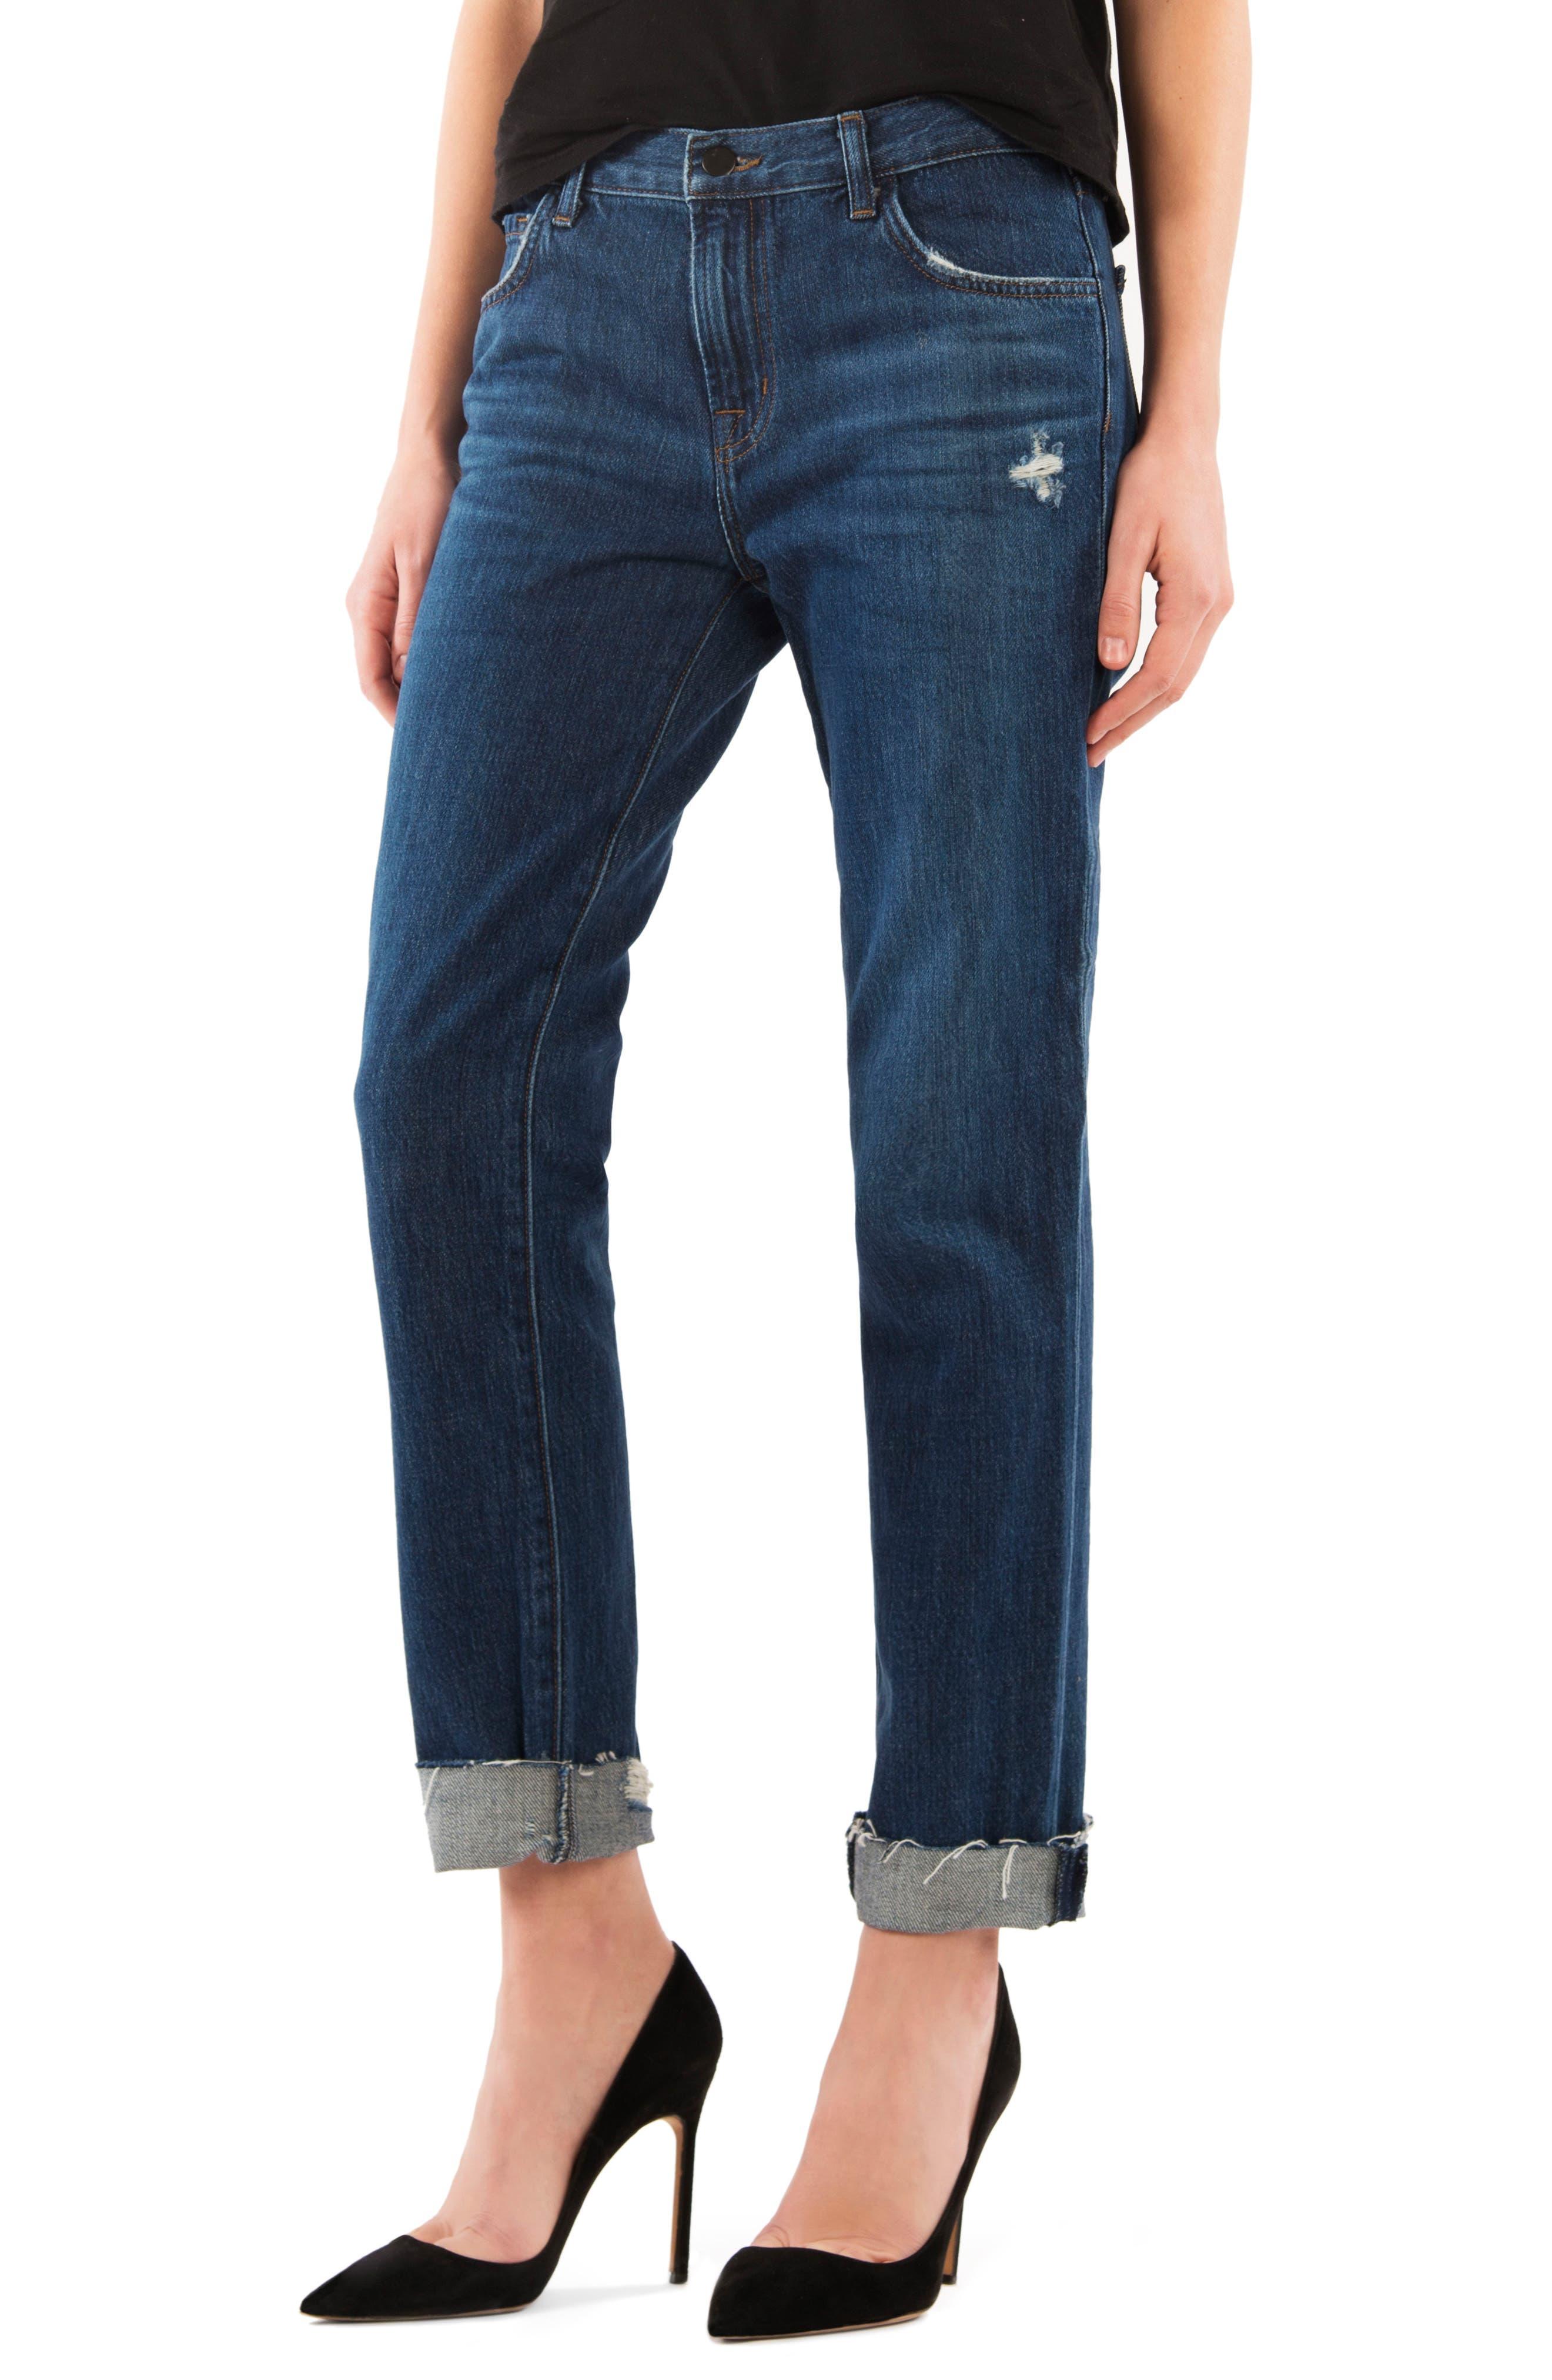 Johnny Mid Rise Boyfriend Jeans,                             Main thumbnail 1, color,                             469